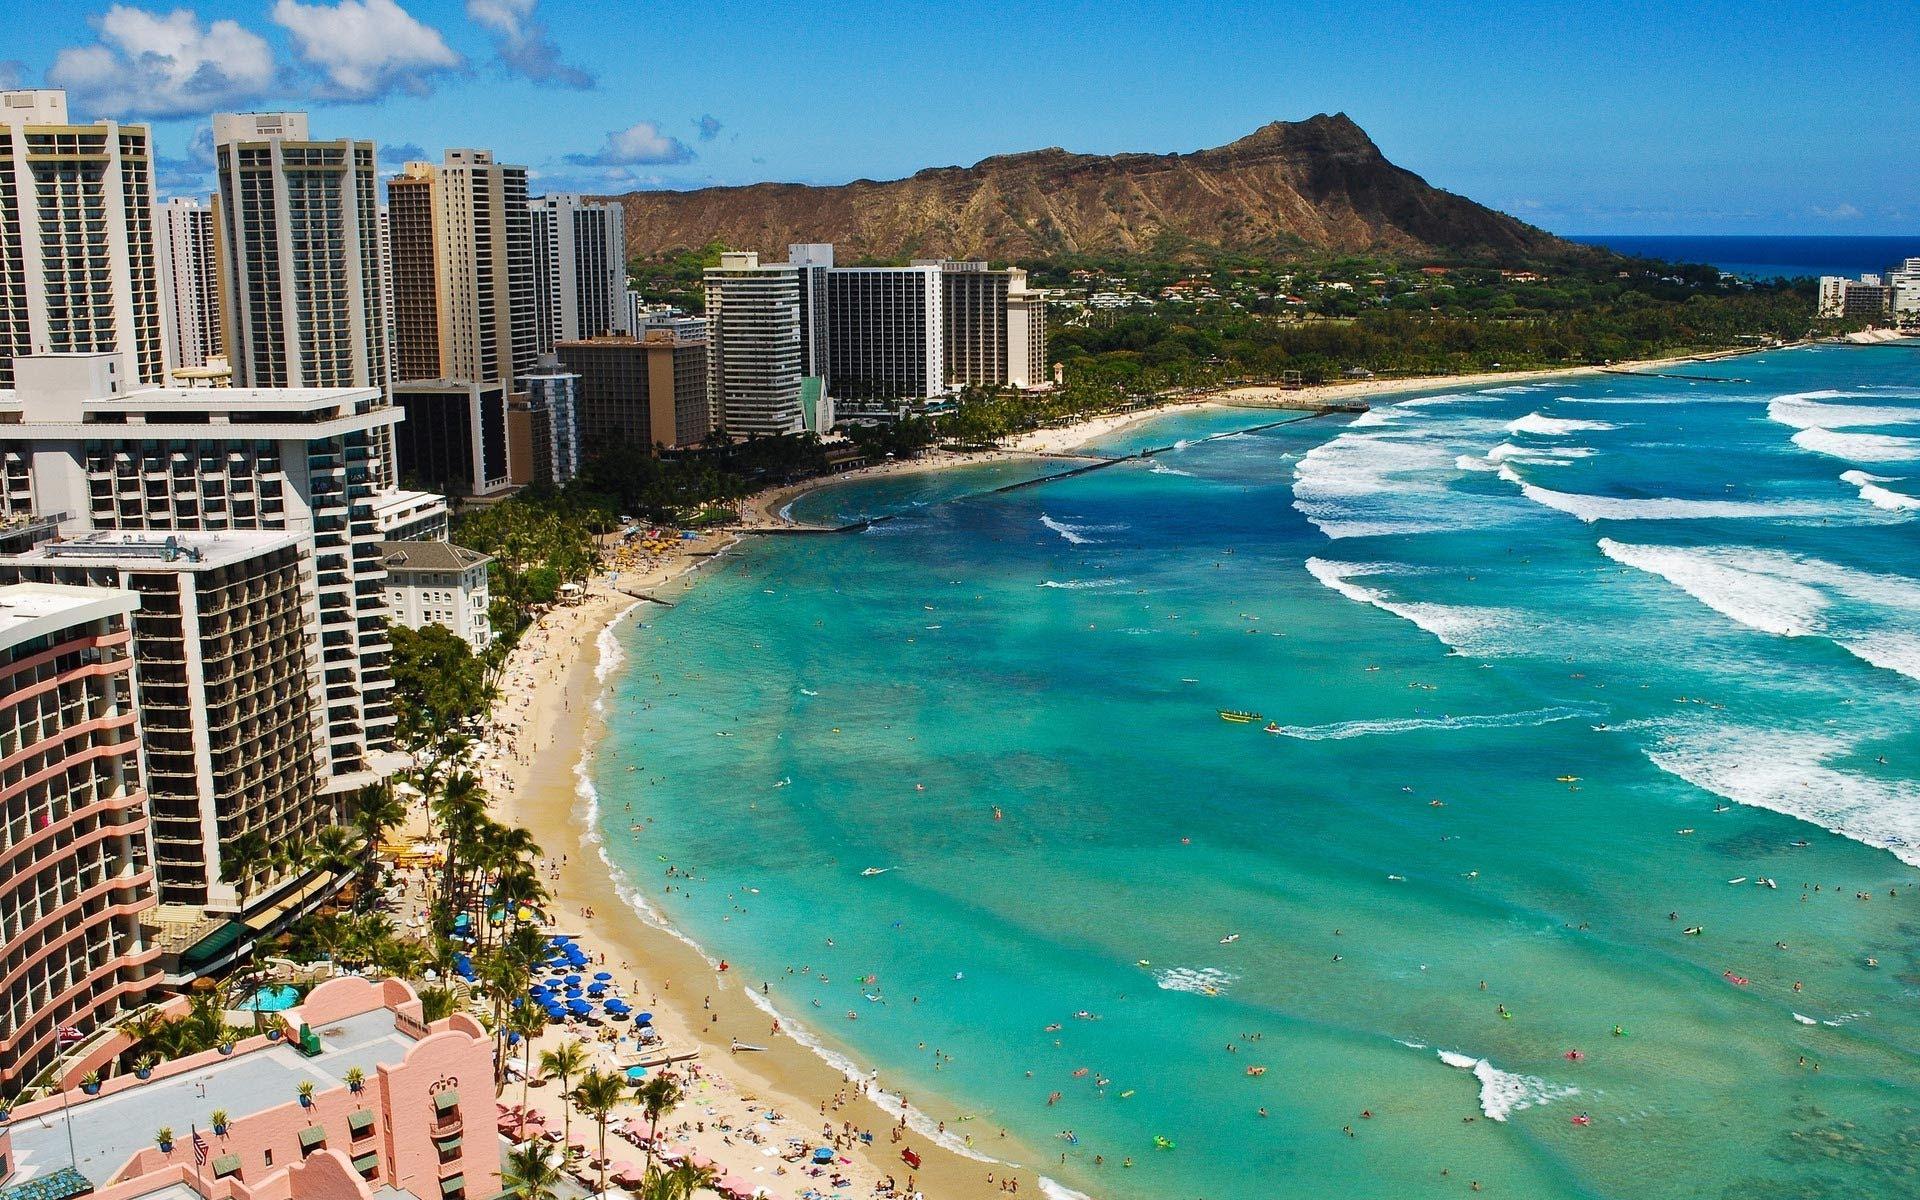 hawaii pool prices